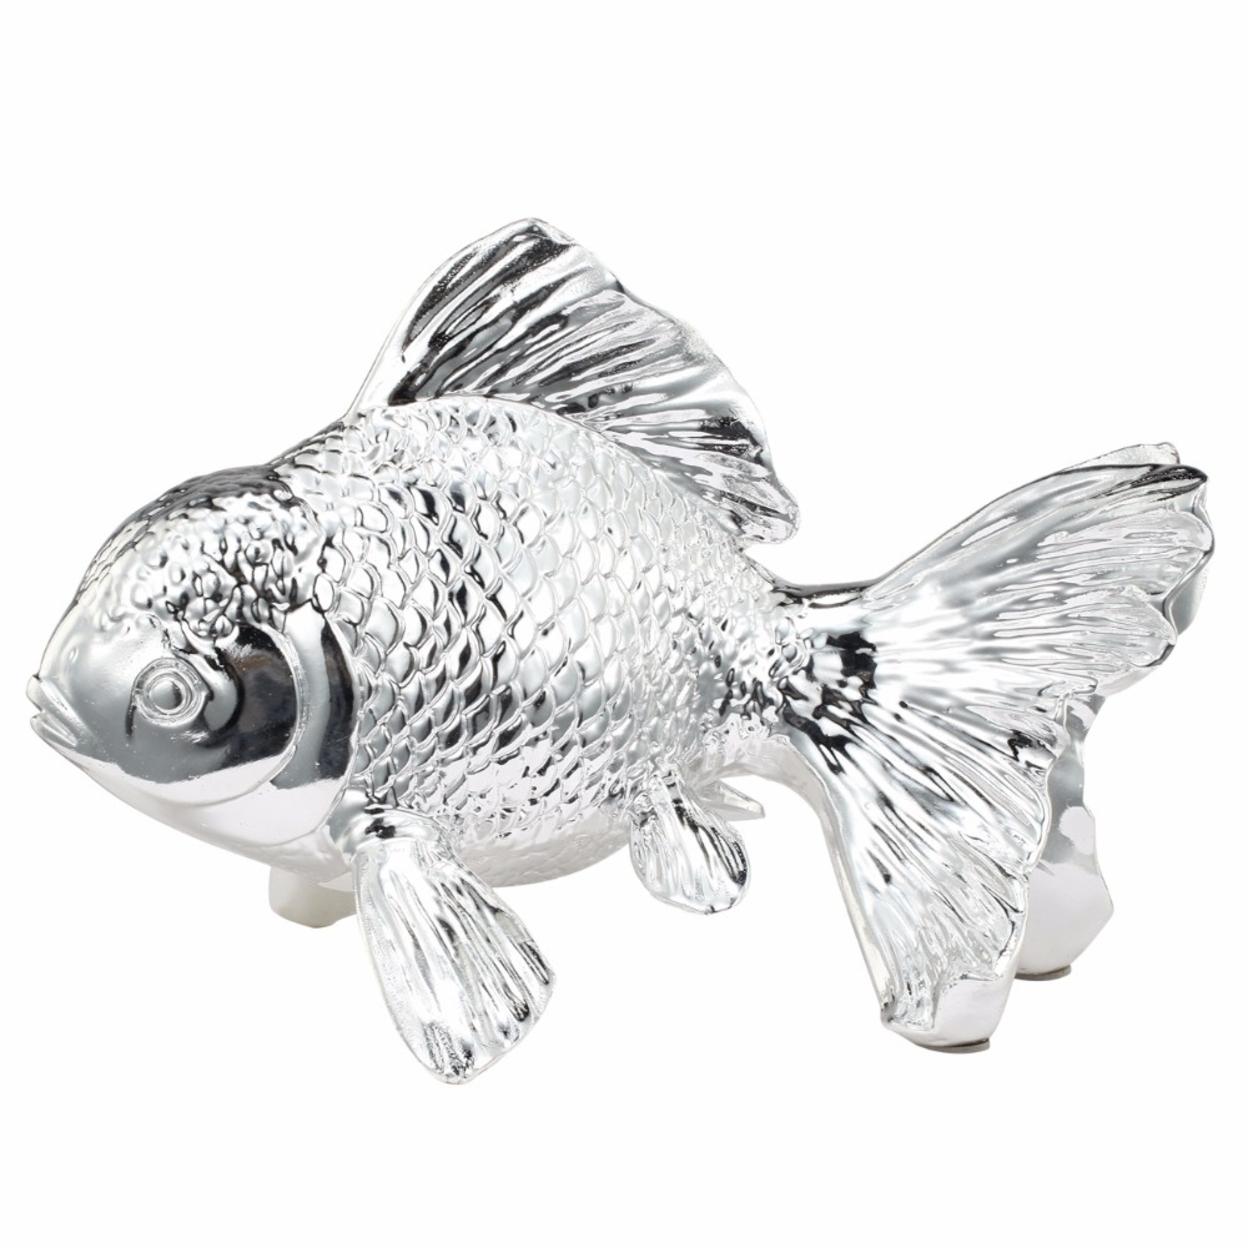 Decorative Mr.Limpet Resin Fish Figurine 59faf6742a00e4698424719c